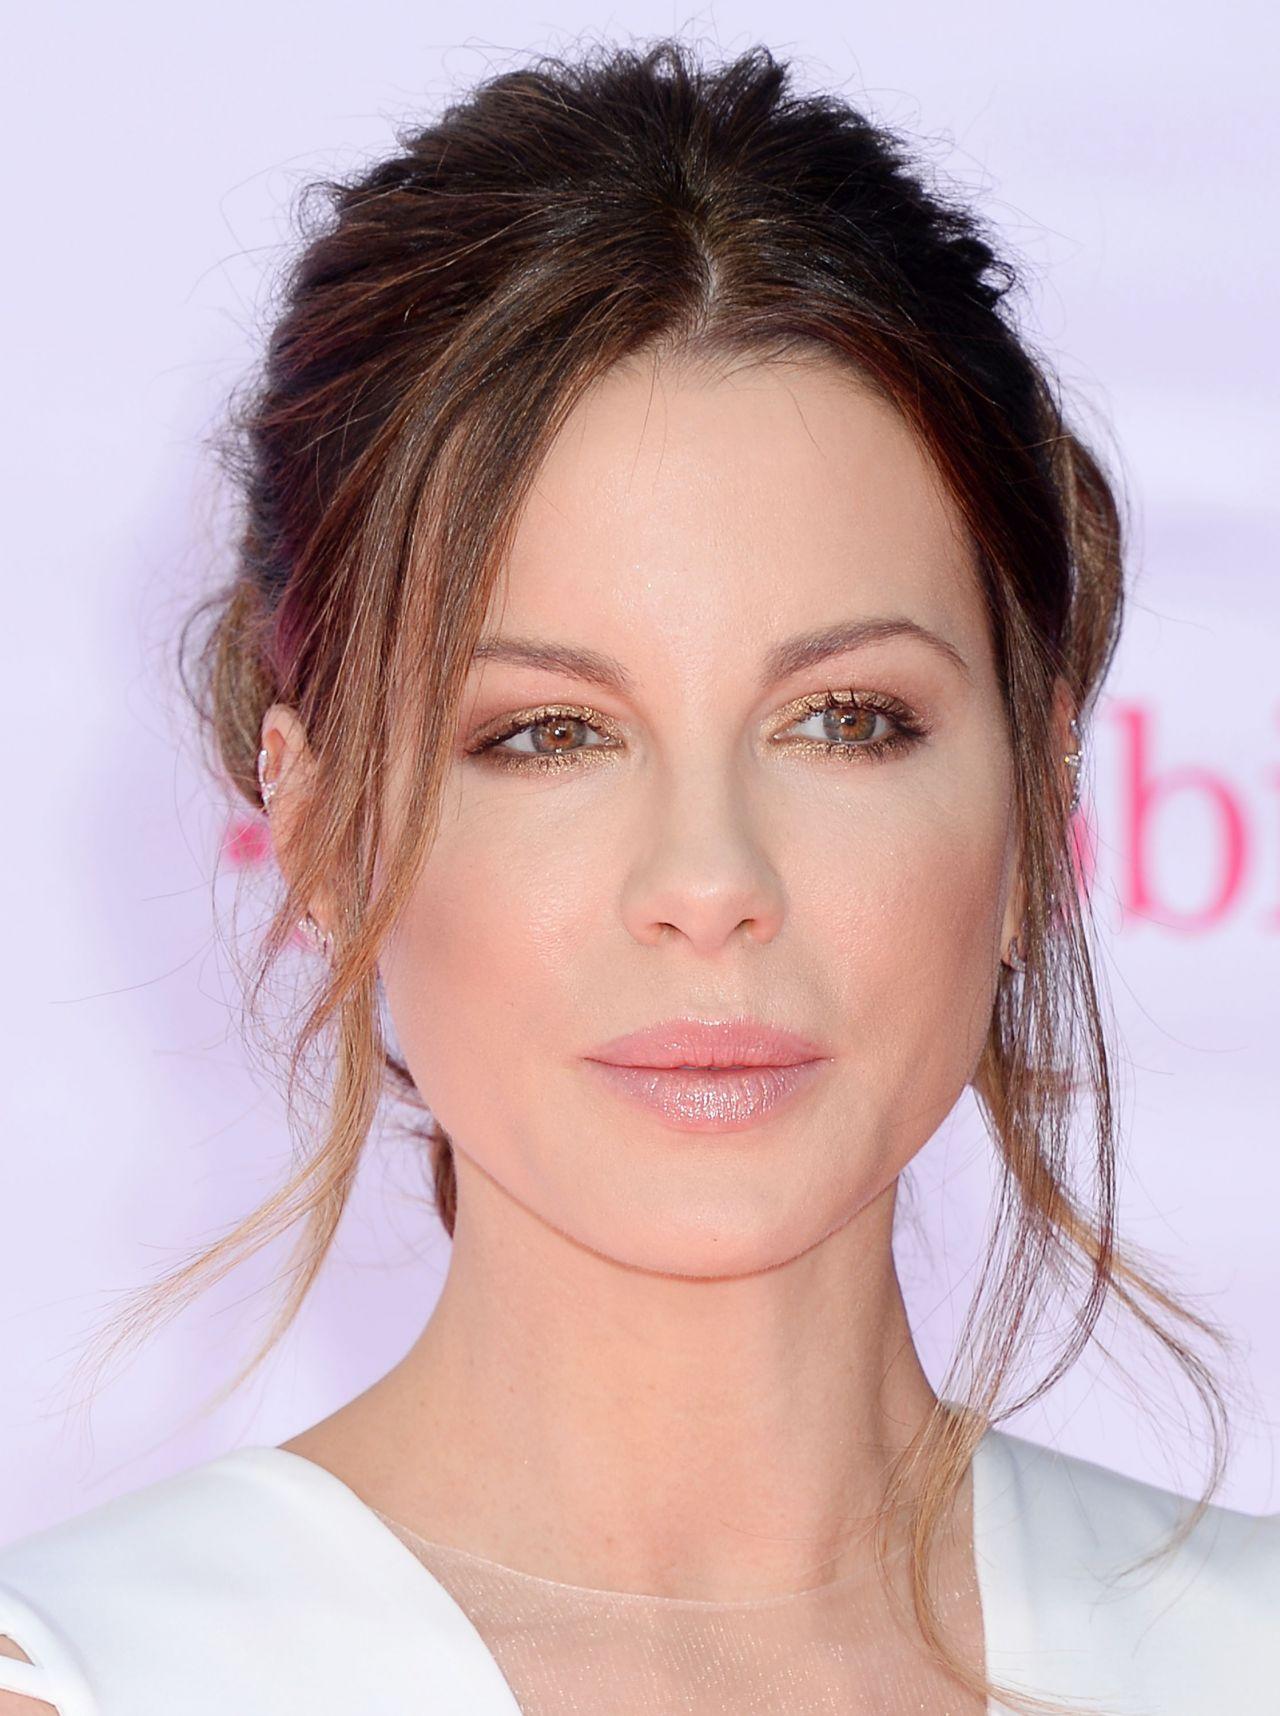 Kate Beckinsale – 2016 Billboard Music Awards in Las Vegas, NV Kate Beckinsale